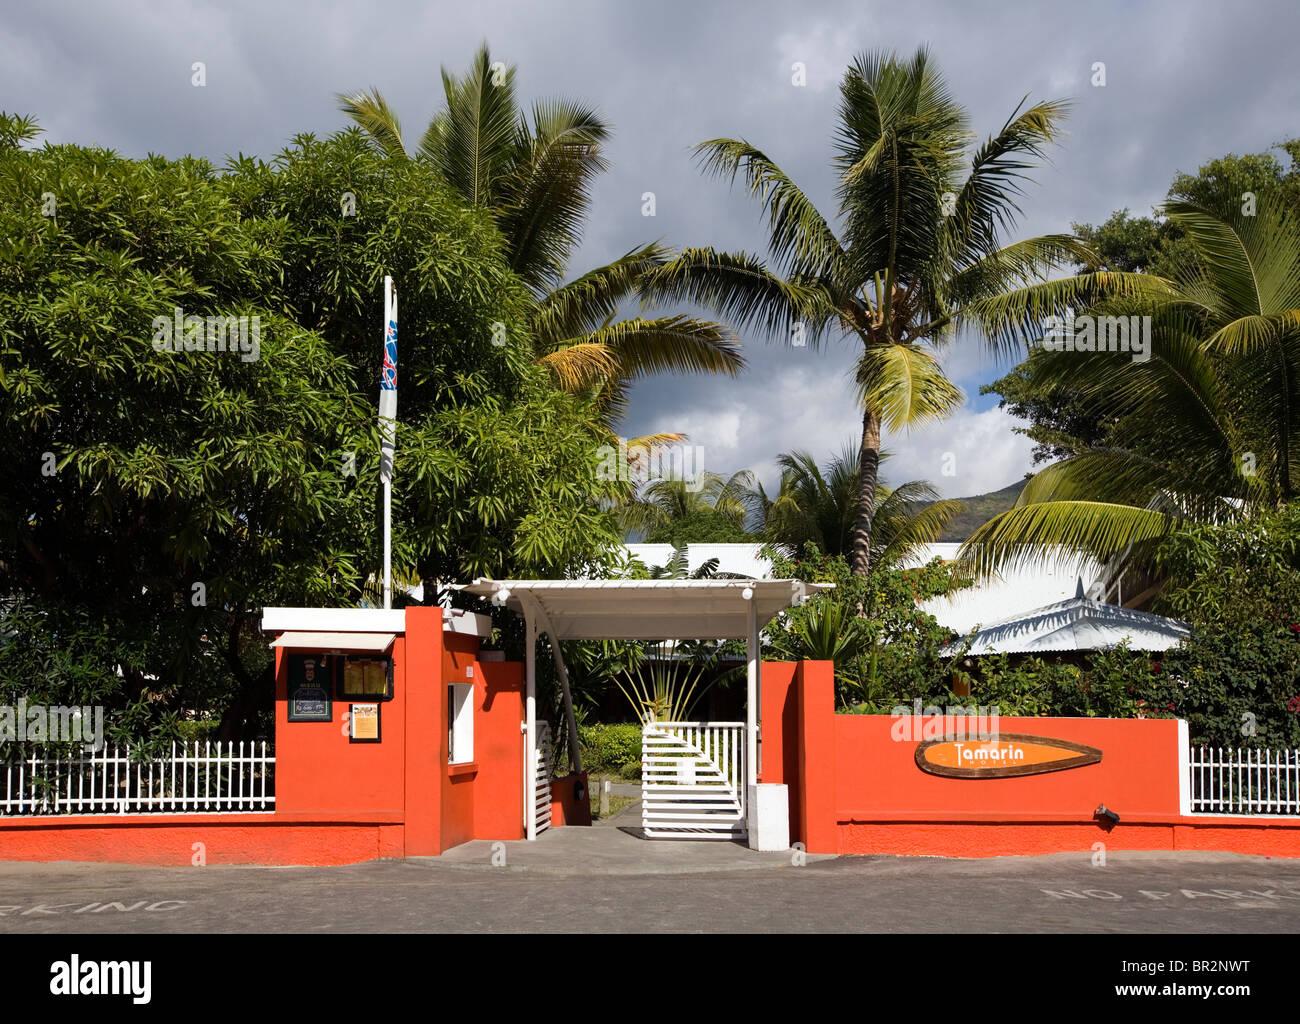 Tamarin Hotel, Tamarin, Mauritius Stock Photo